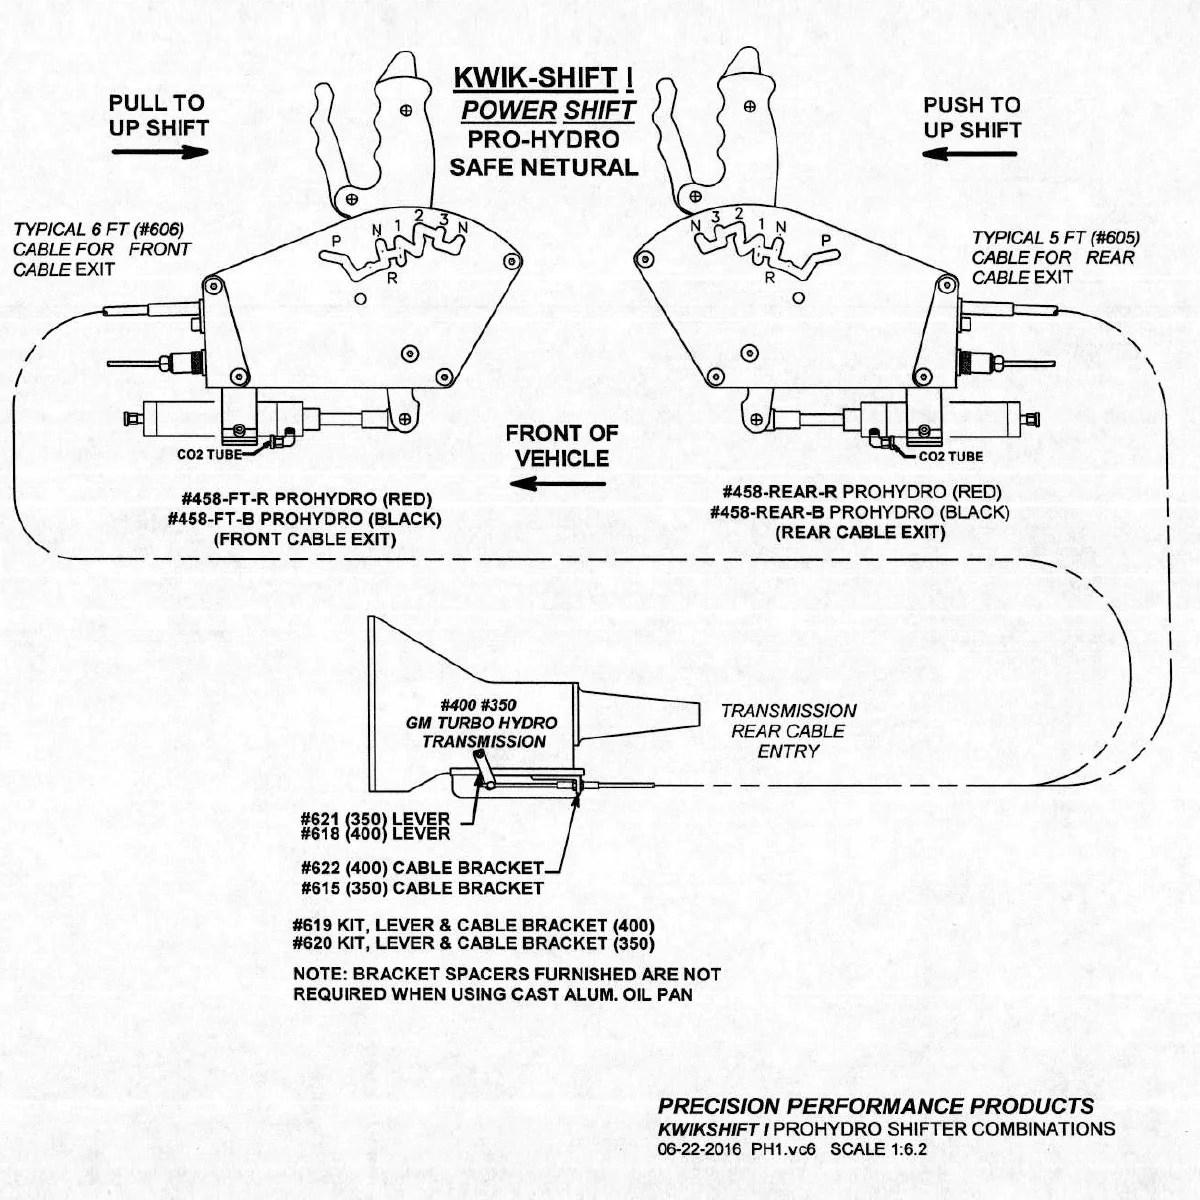 medium resolution of th400 sensor diagram wiring diagrams scematic th400 no reverse th400 sensor diagram